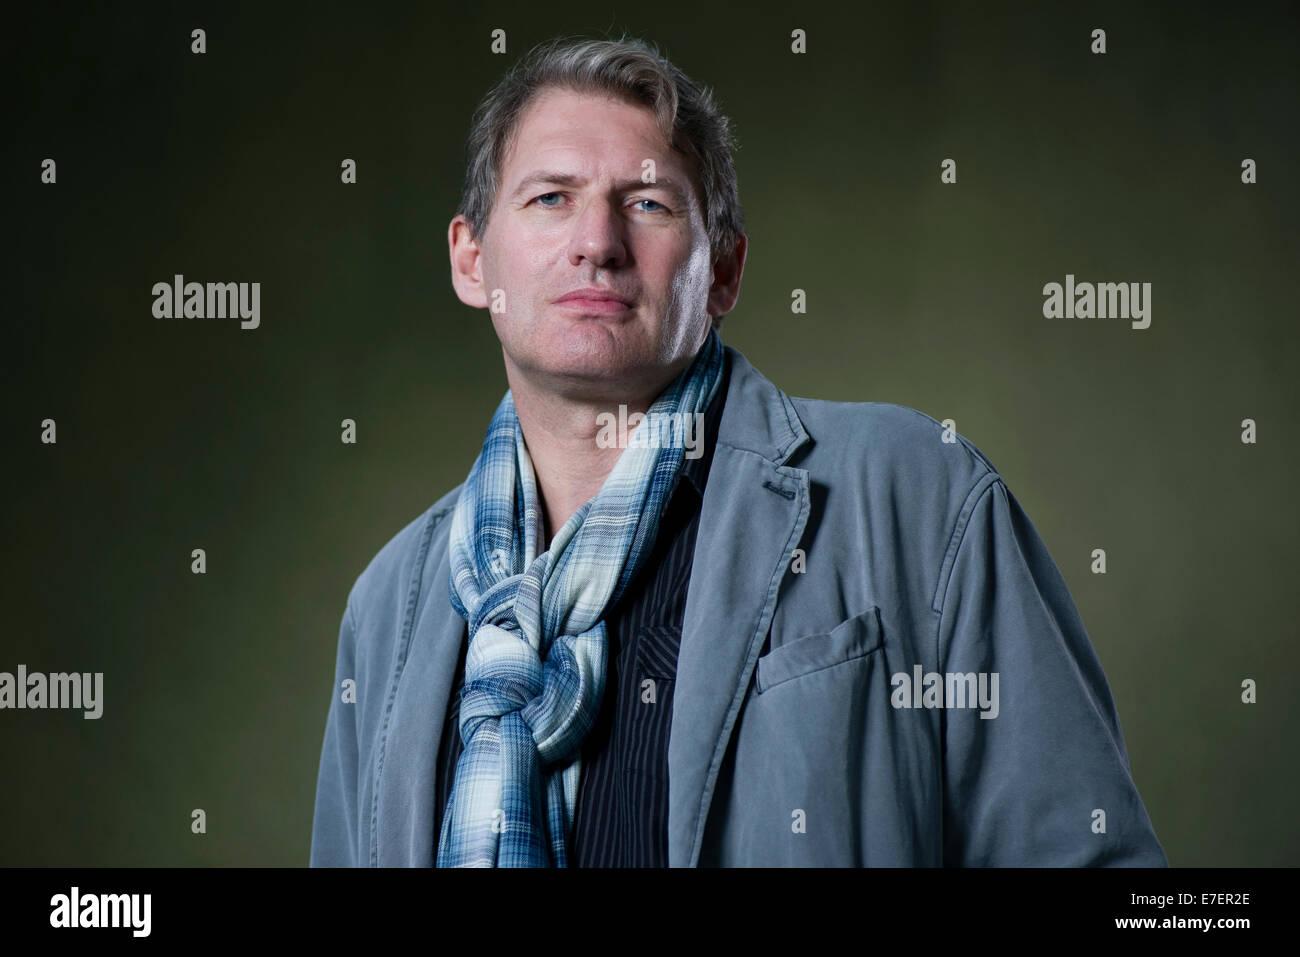 Scottish novelist Alan Warner appears at the Edinburgh International Book Festival. - Stock Image